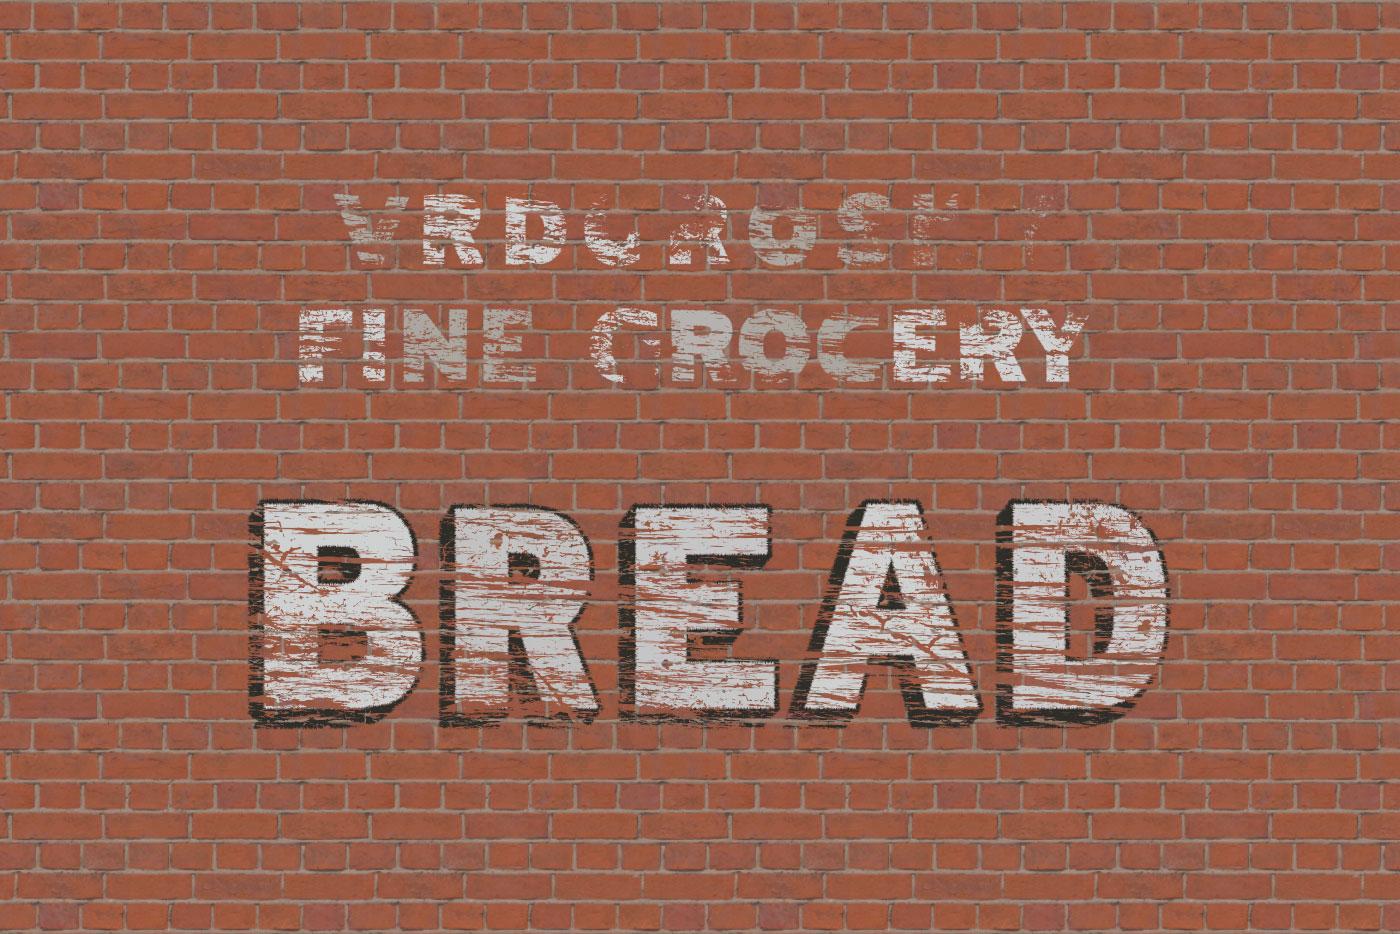 aged bread graphic